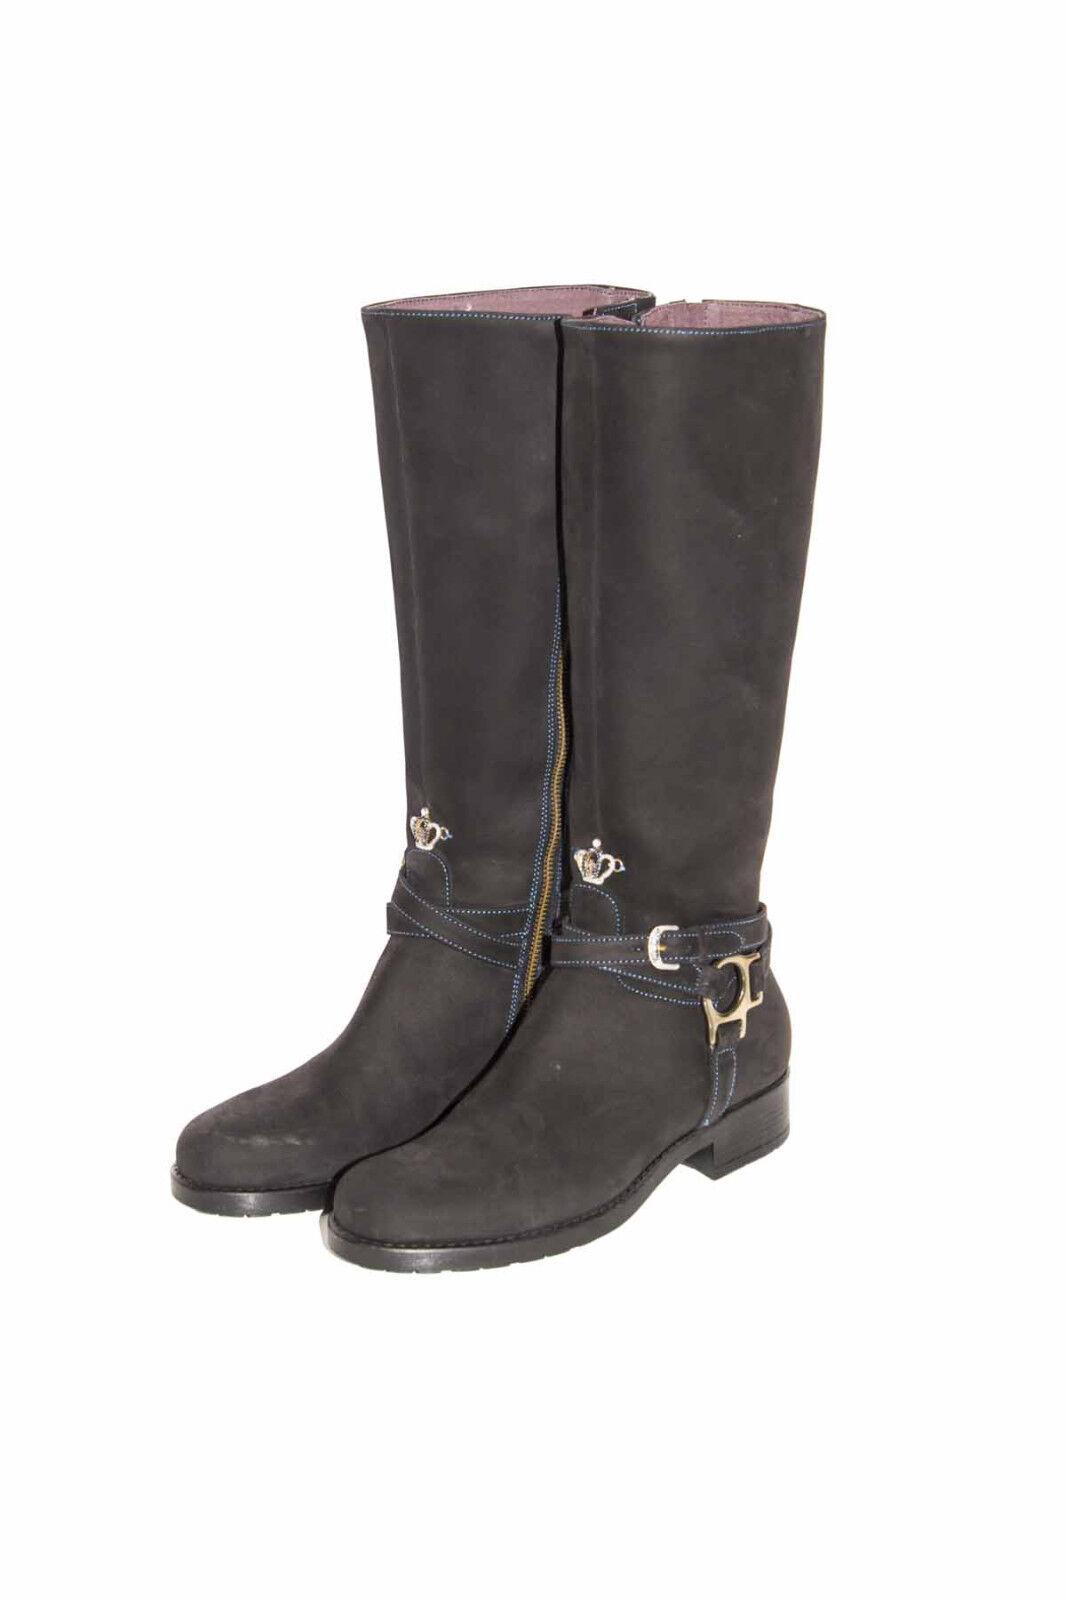 Elisa Cavaletti botas negro talla 37,38,40  otoño invierno 2018 2019